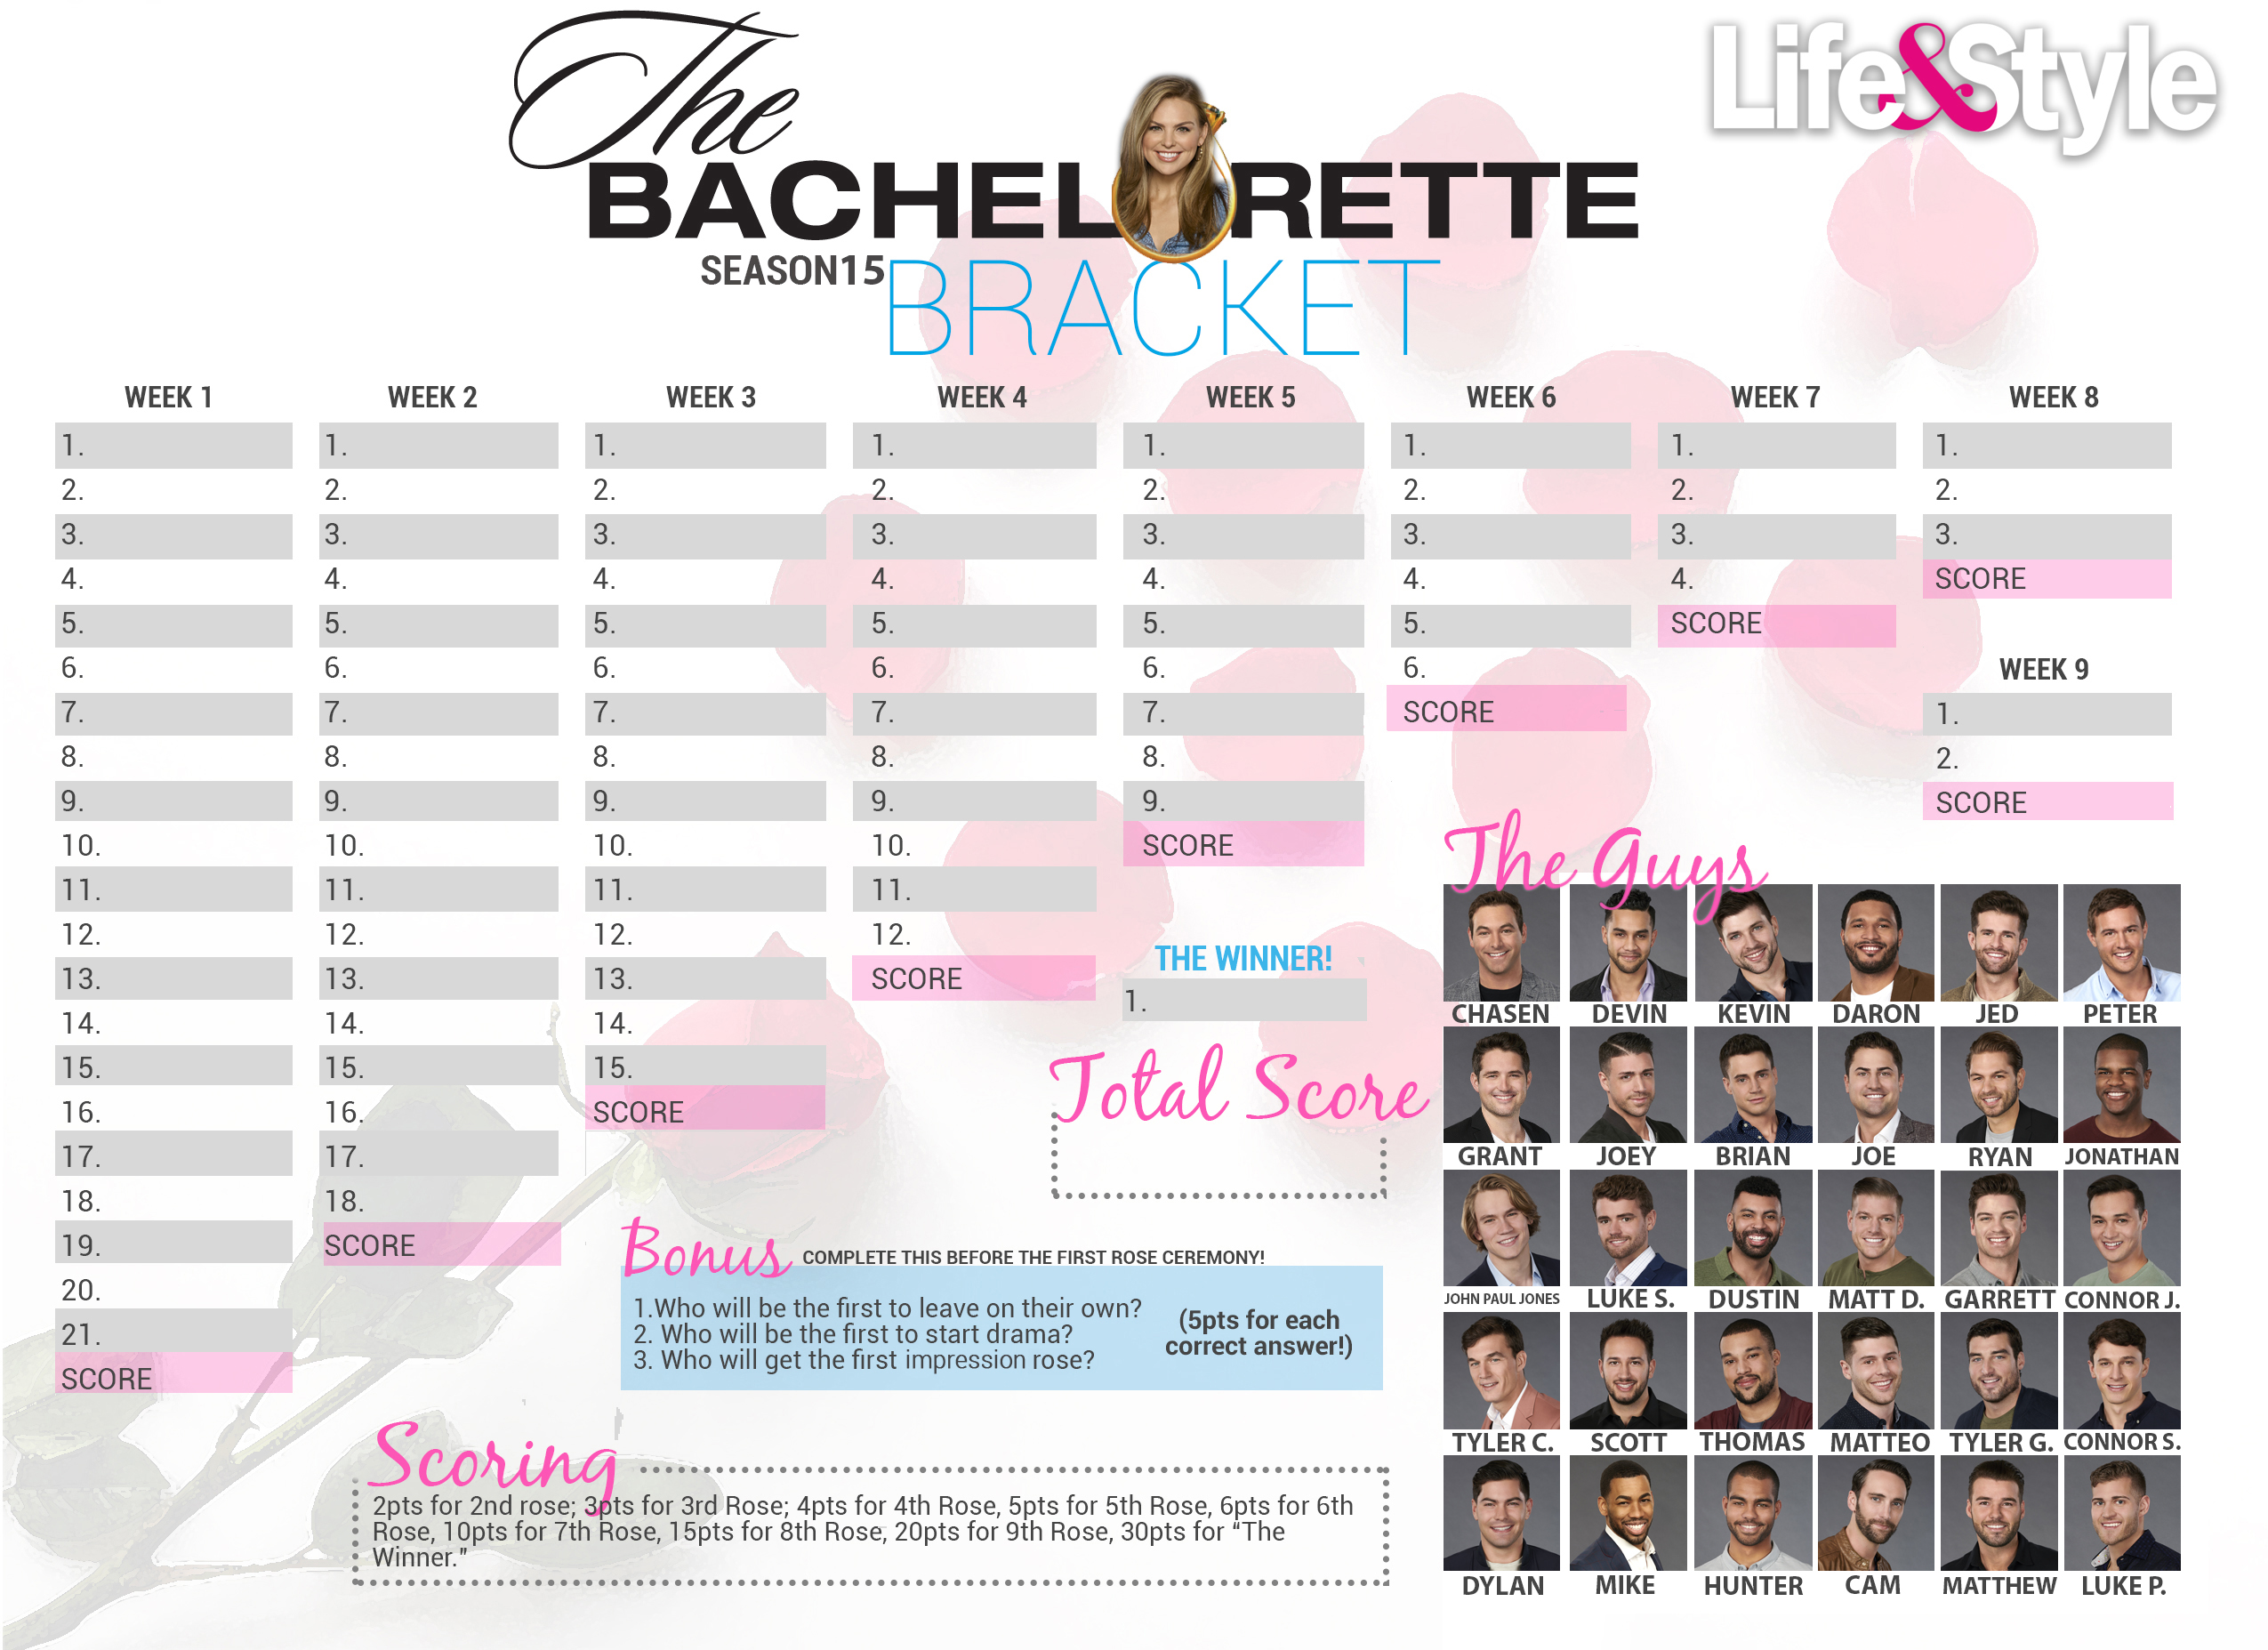 photograph regarding Bachelorette Bracket Printable titled The Printable Bachelorette Bracket for Hannah B.s Period